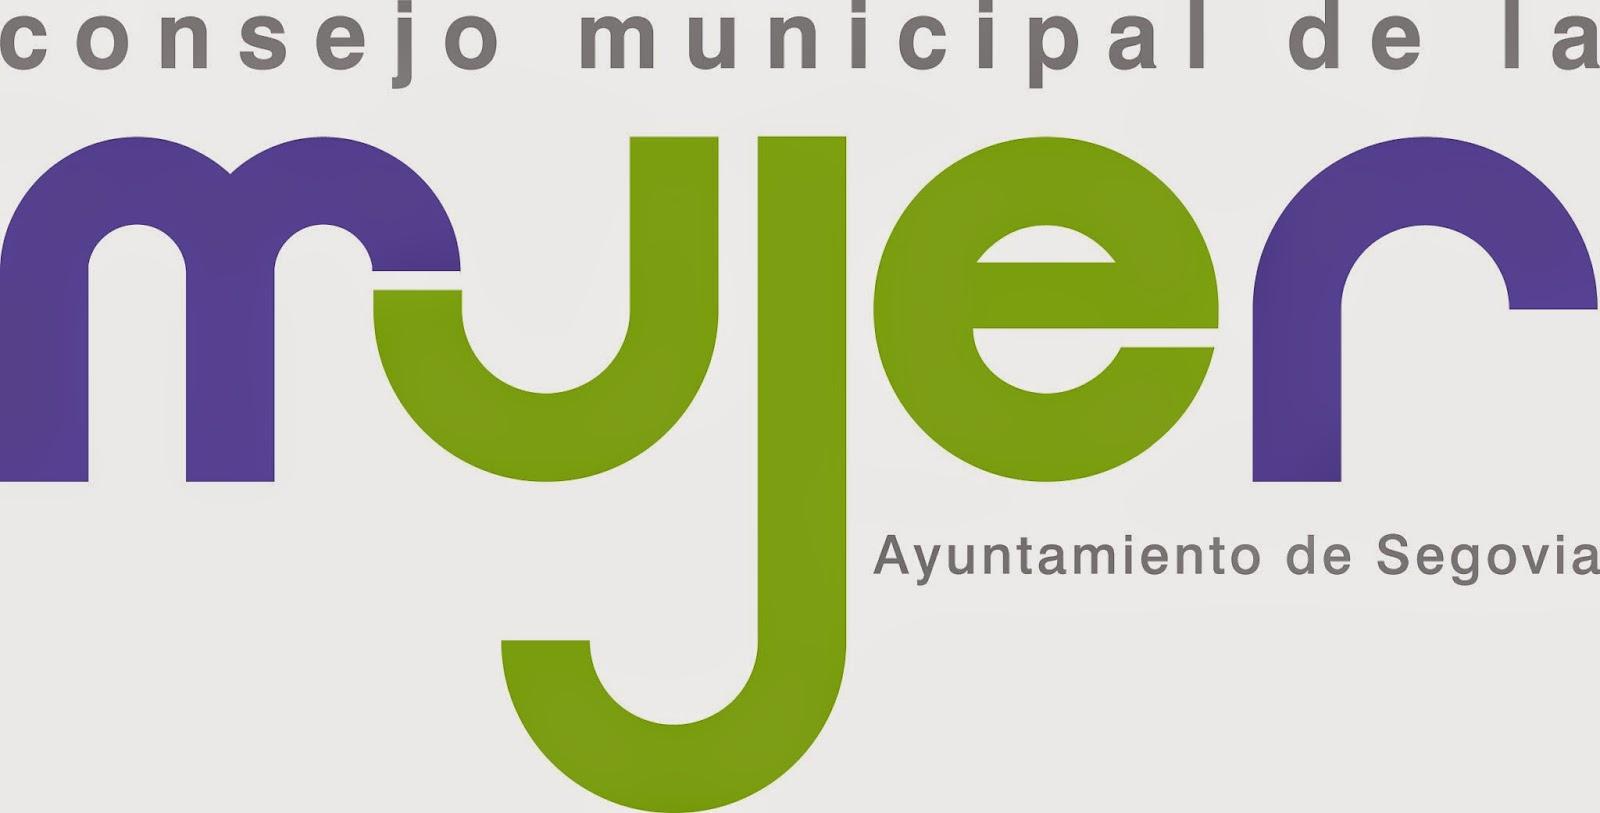 Ir a la web del Consejo Municipal de la Mujer